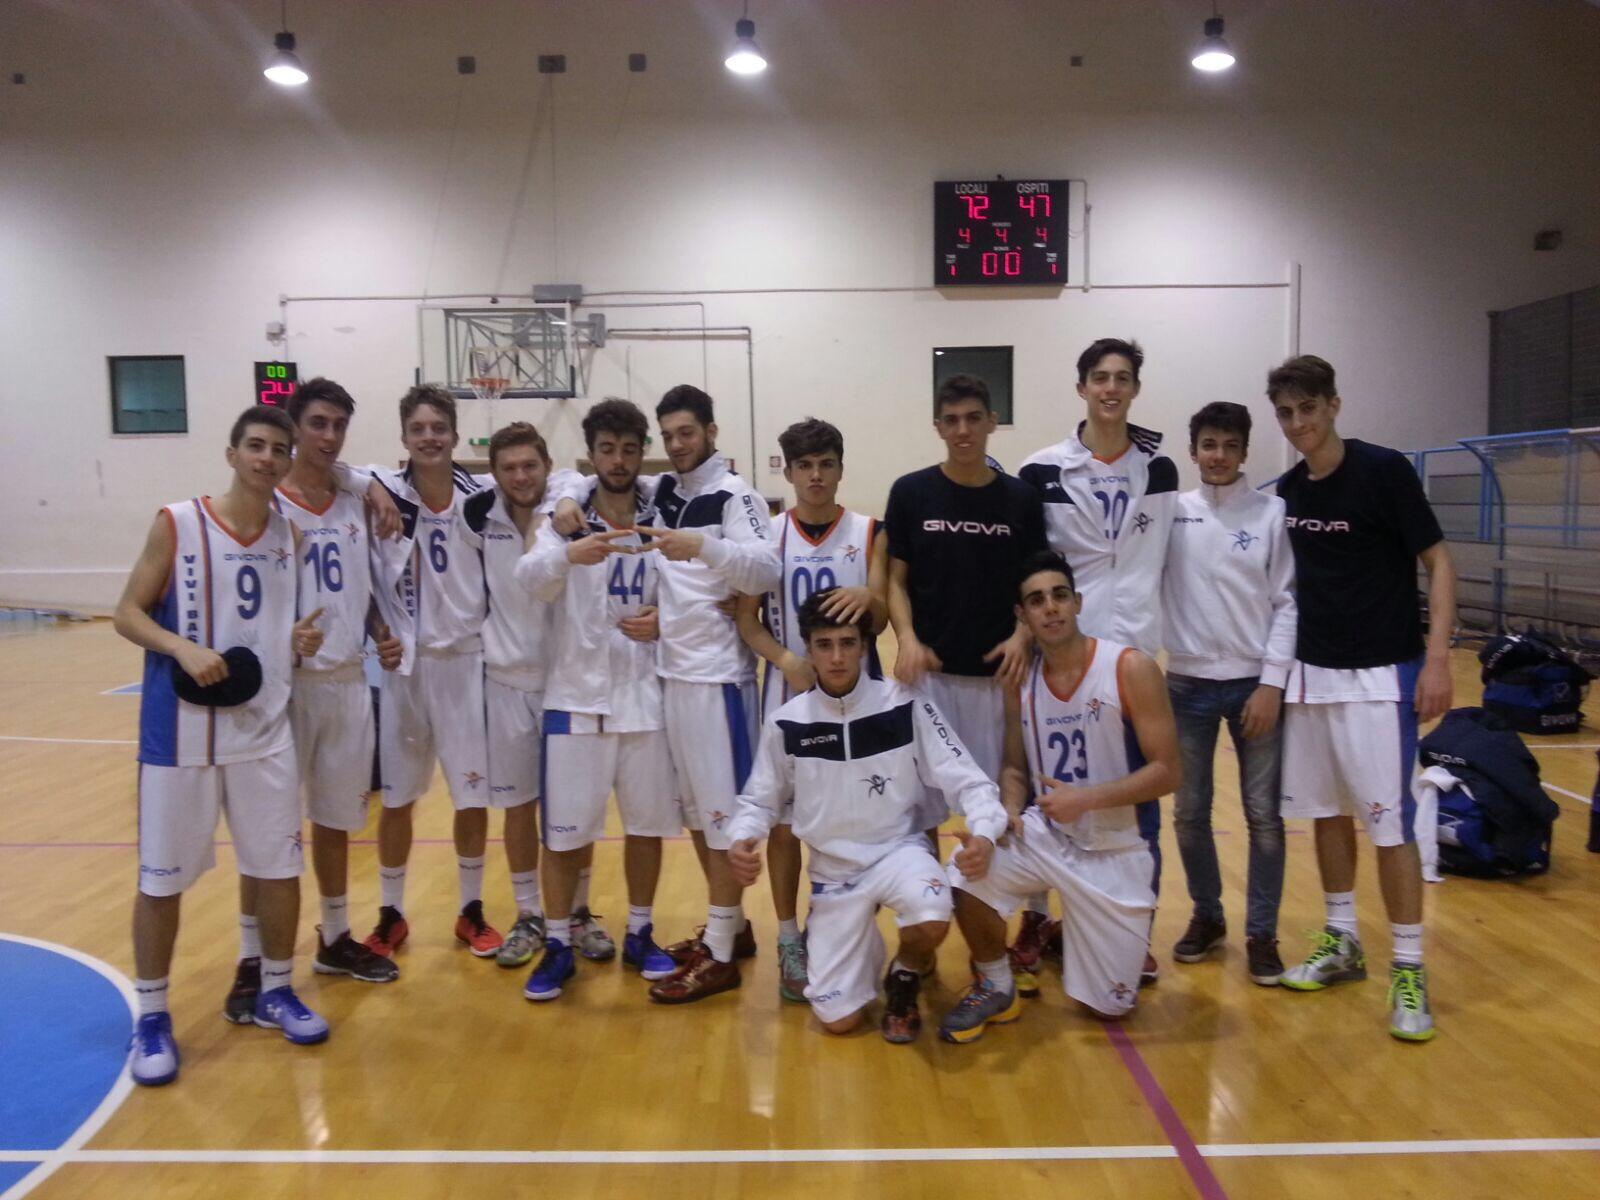 Under 18 Eccellenza: Vivi Basket straordinaria prestazione